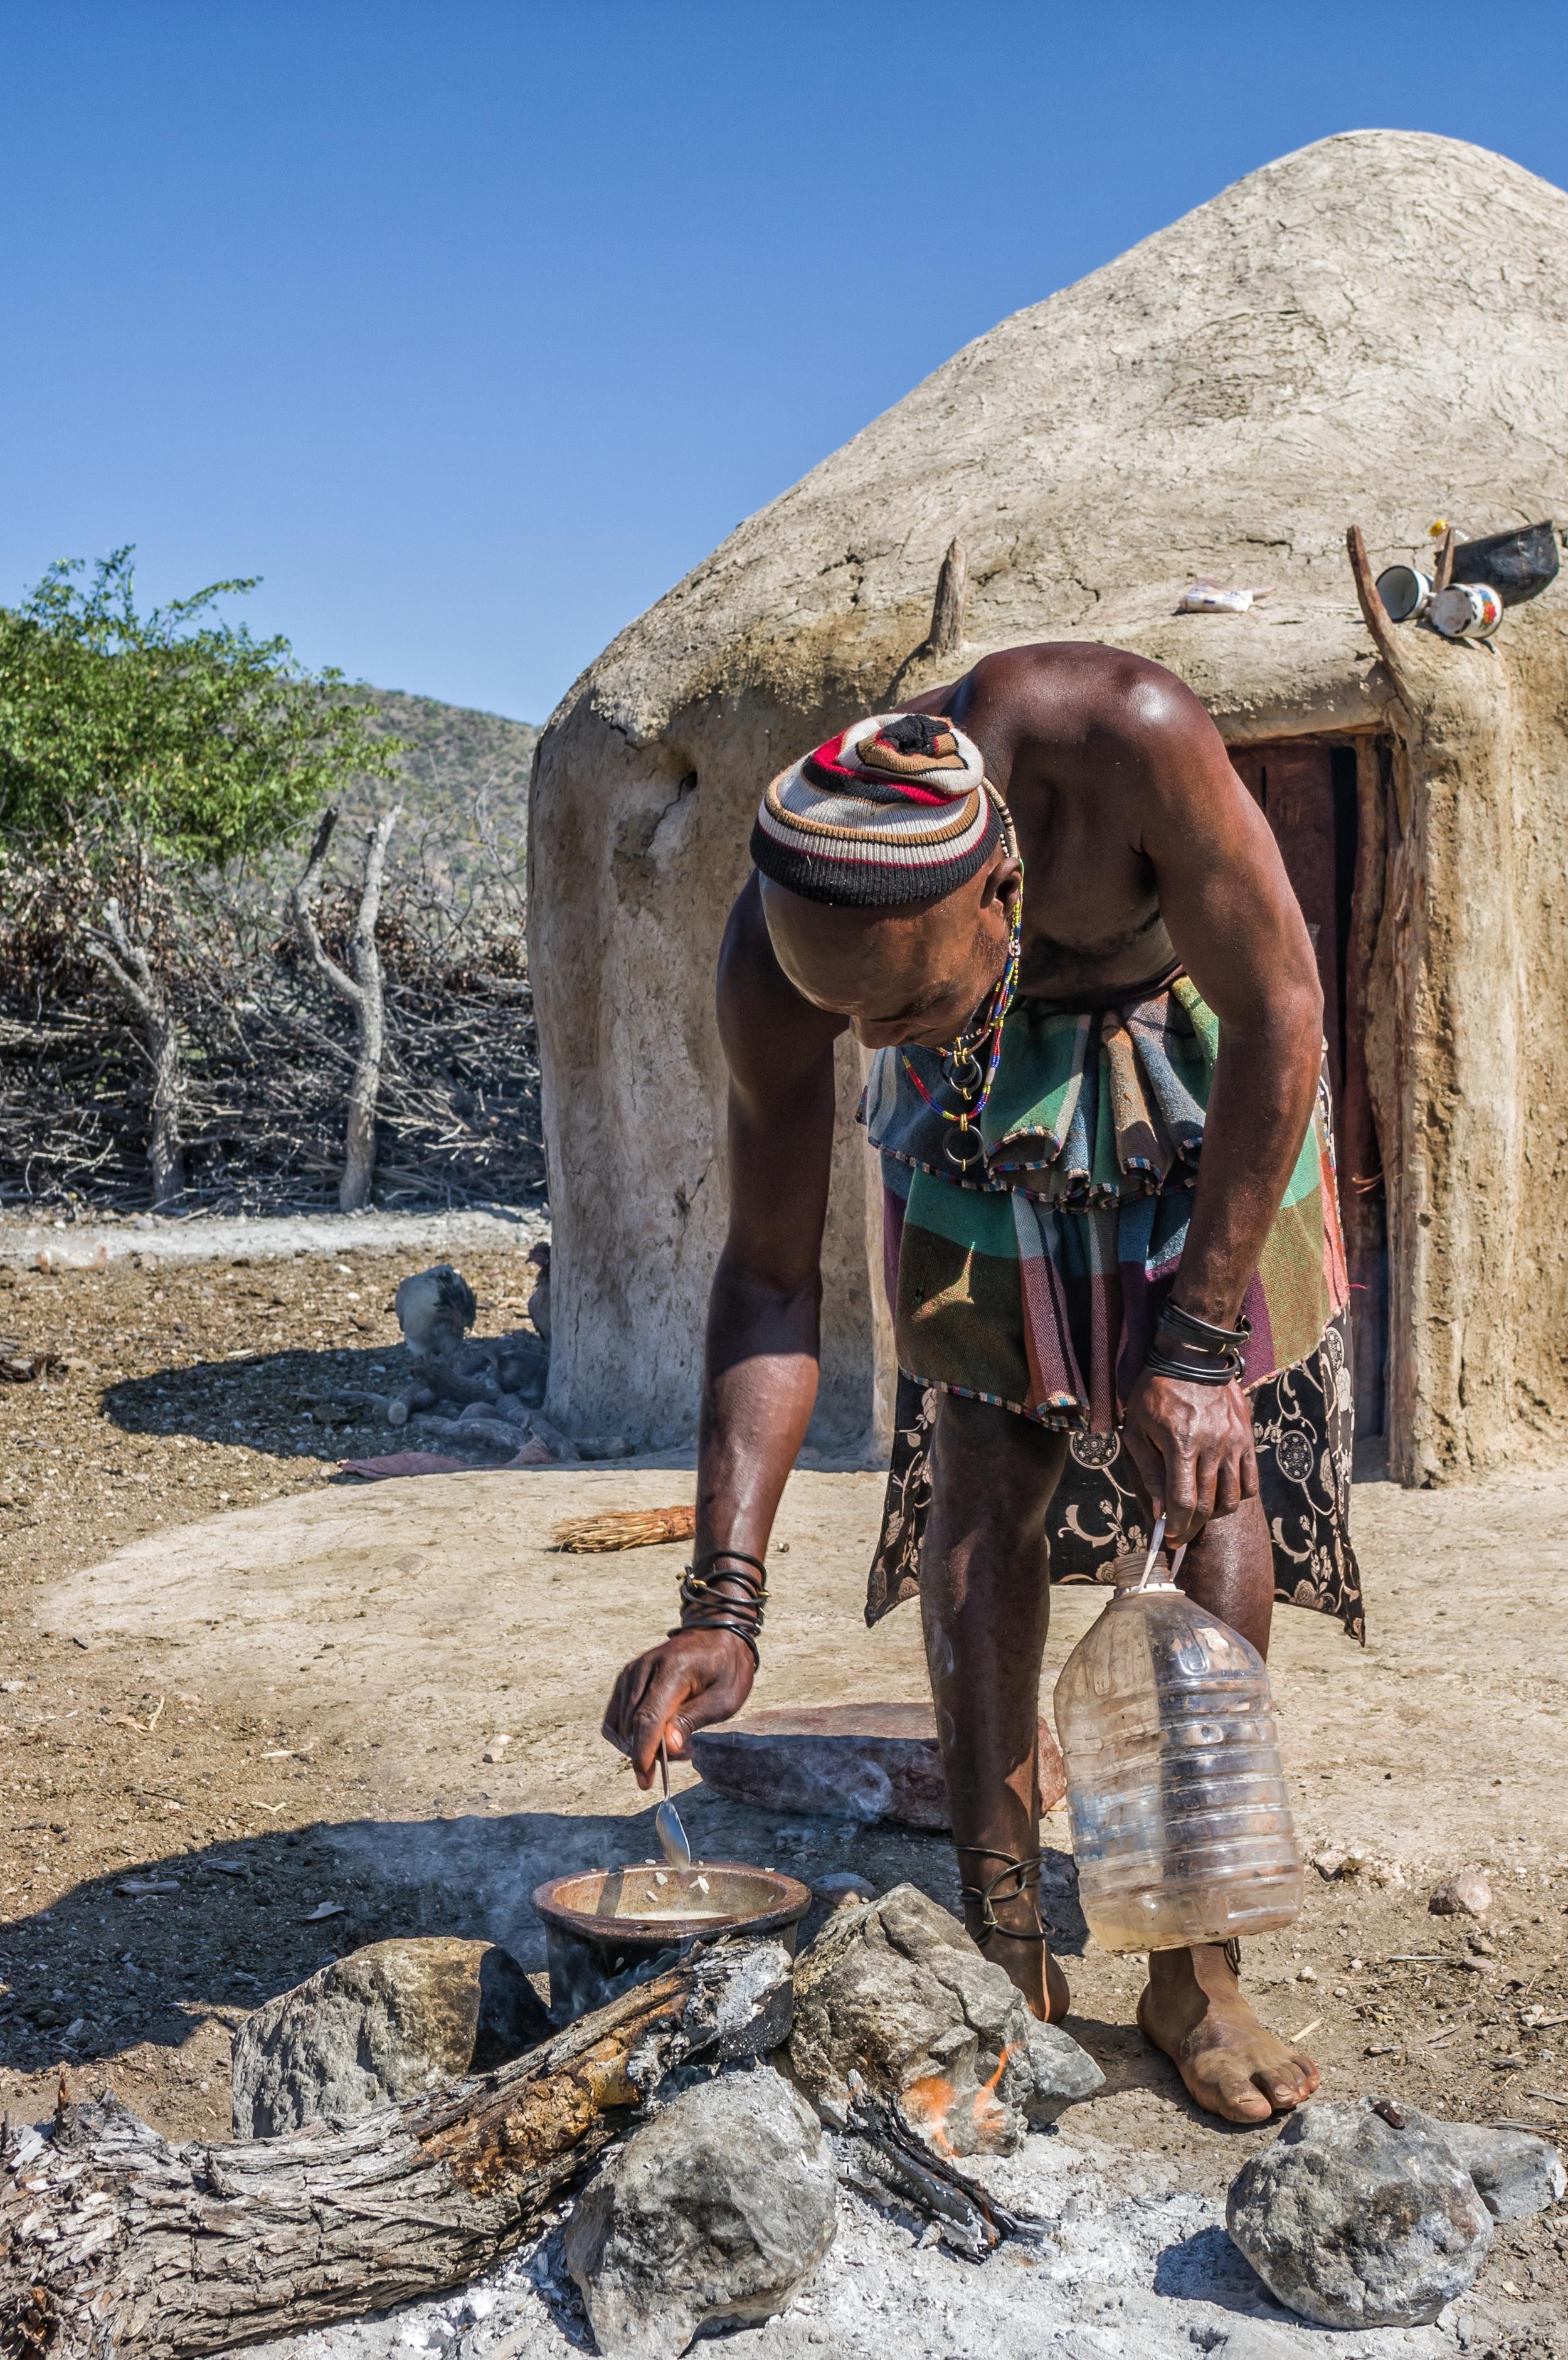 NORTH, NAMIBIA